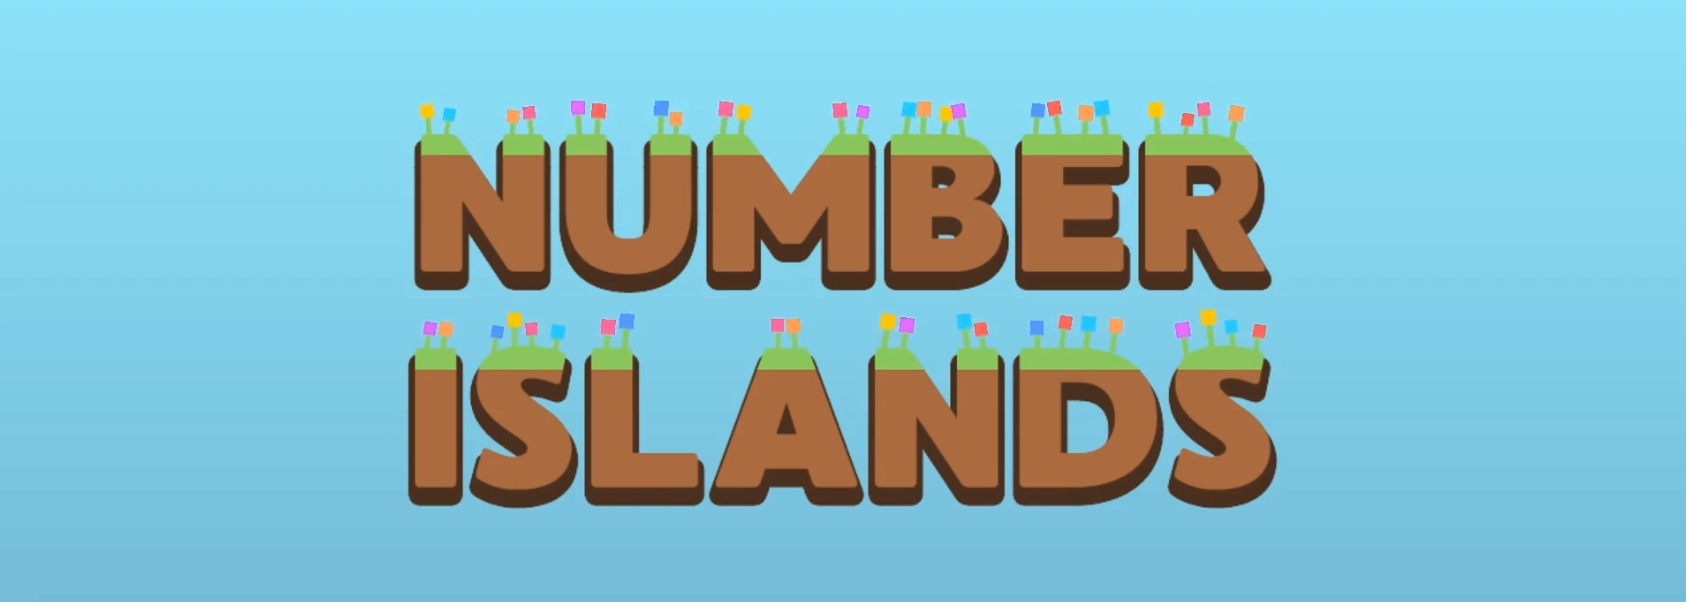 Number Islands